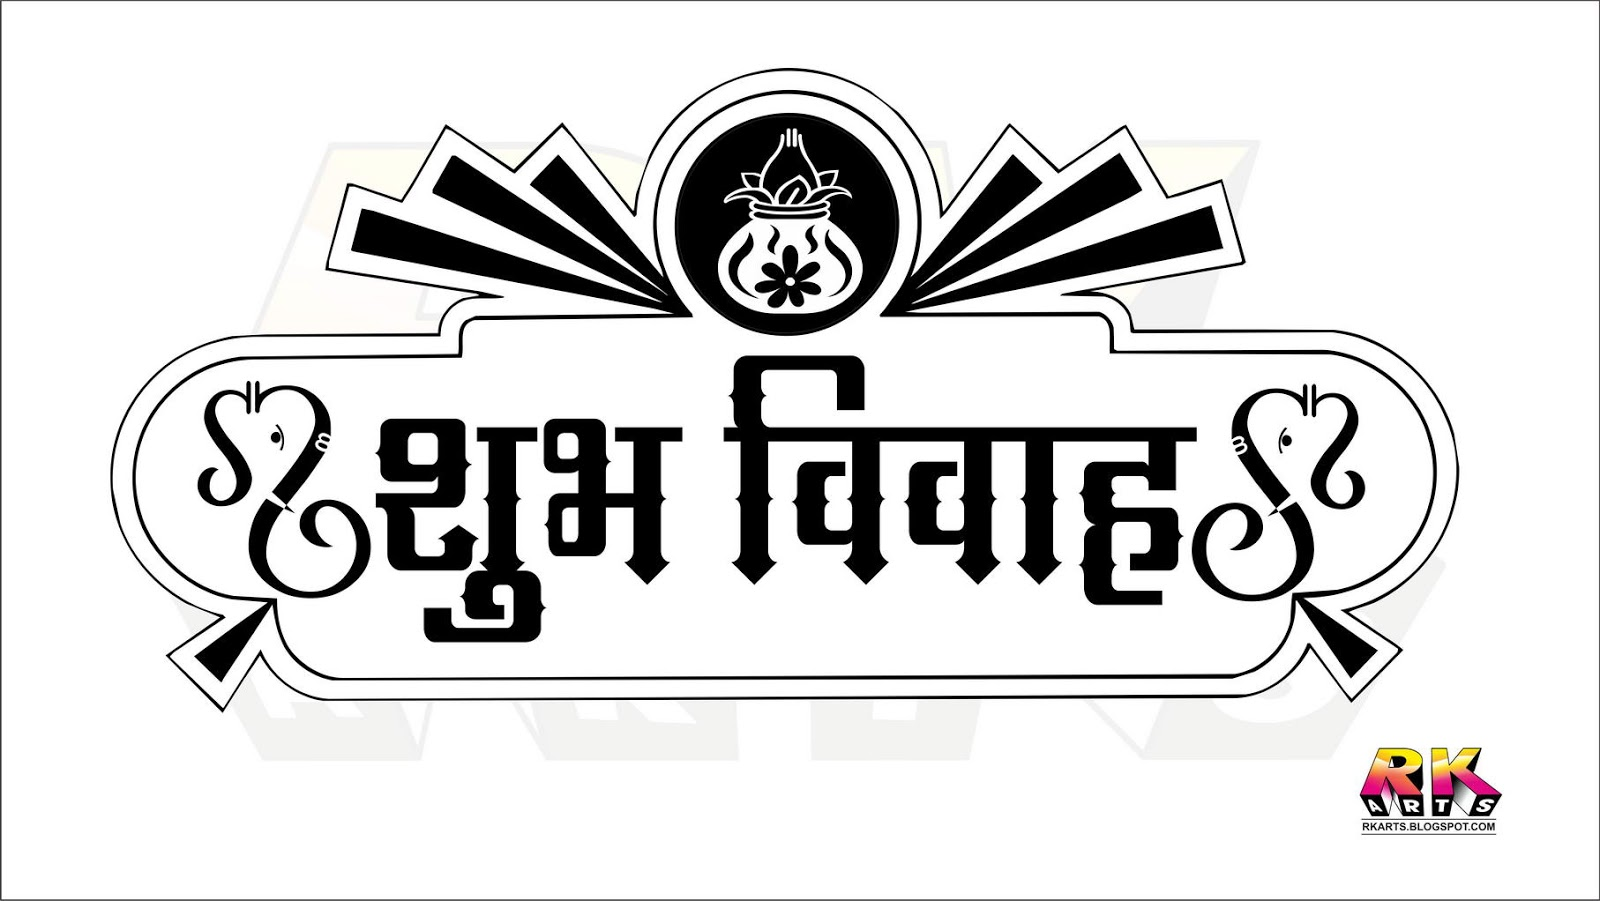 शुभ विवाह shubh vivah wedding title logo typography  rk